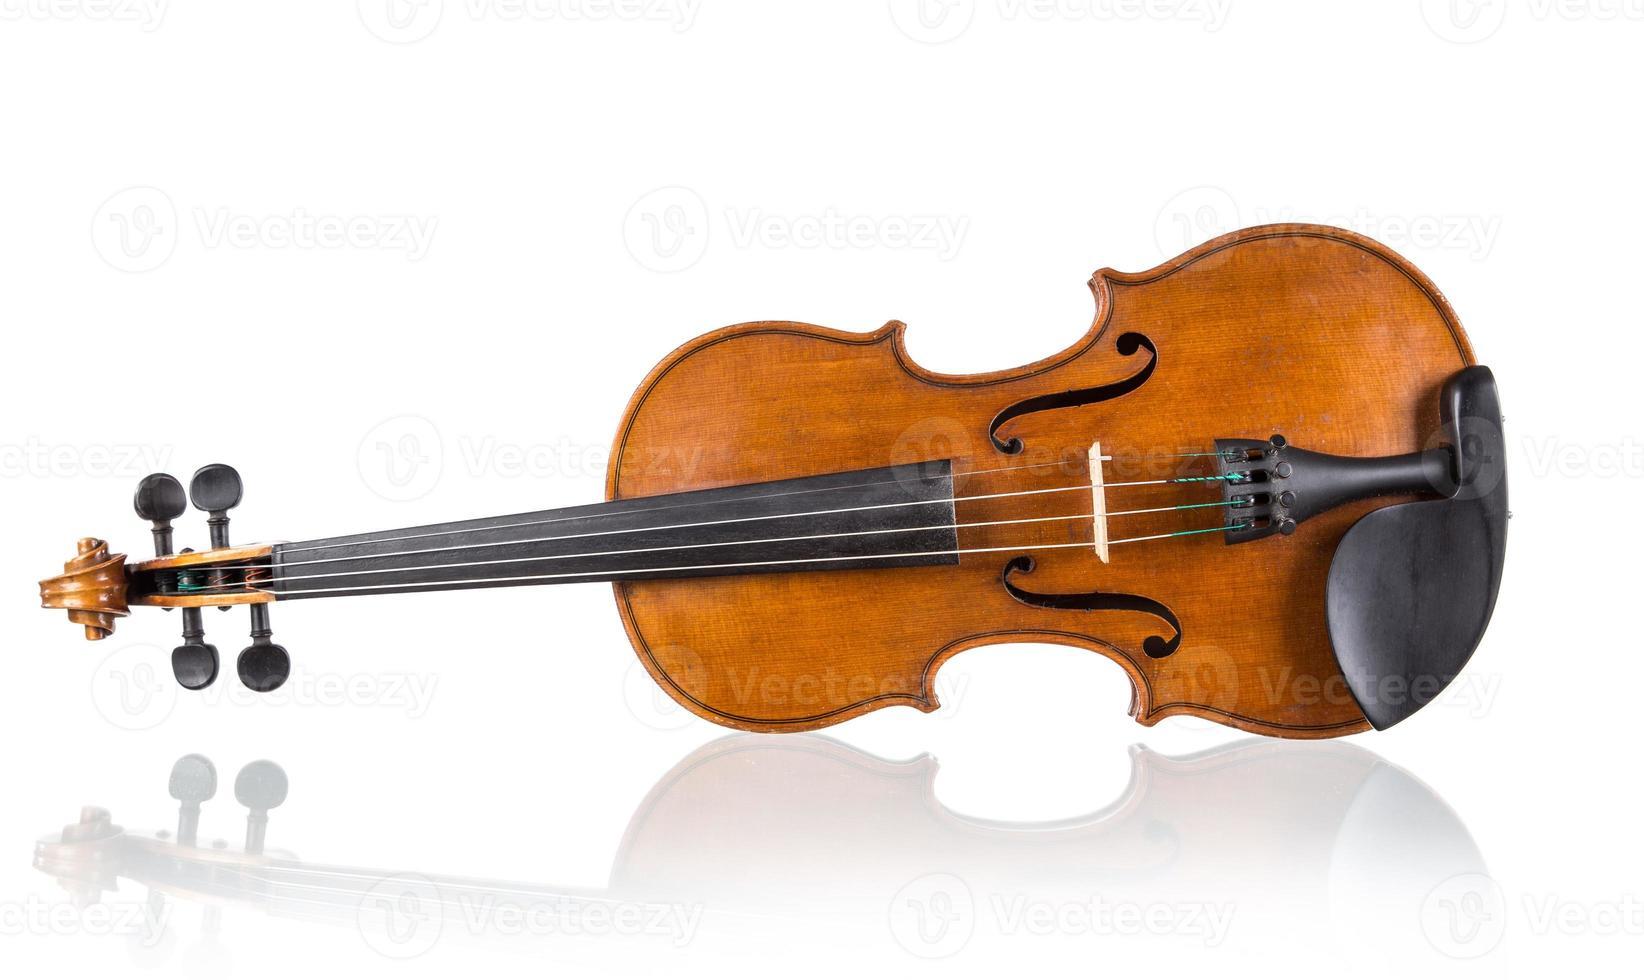 viool in vintage stijl foto